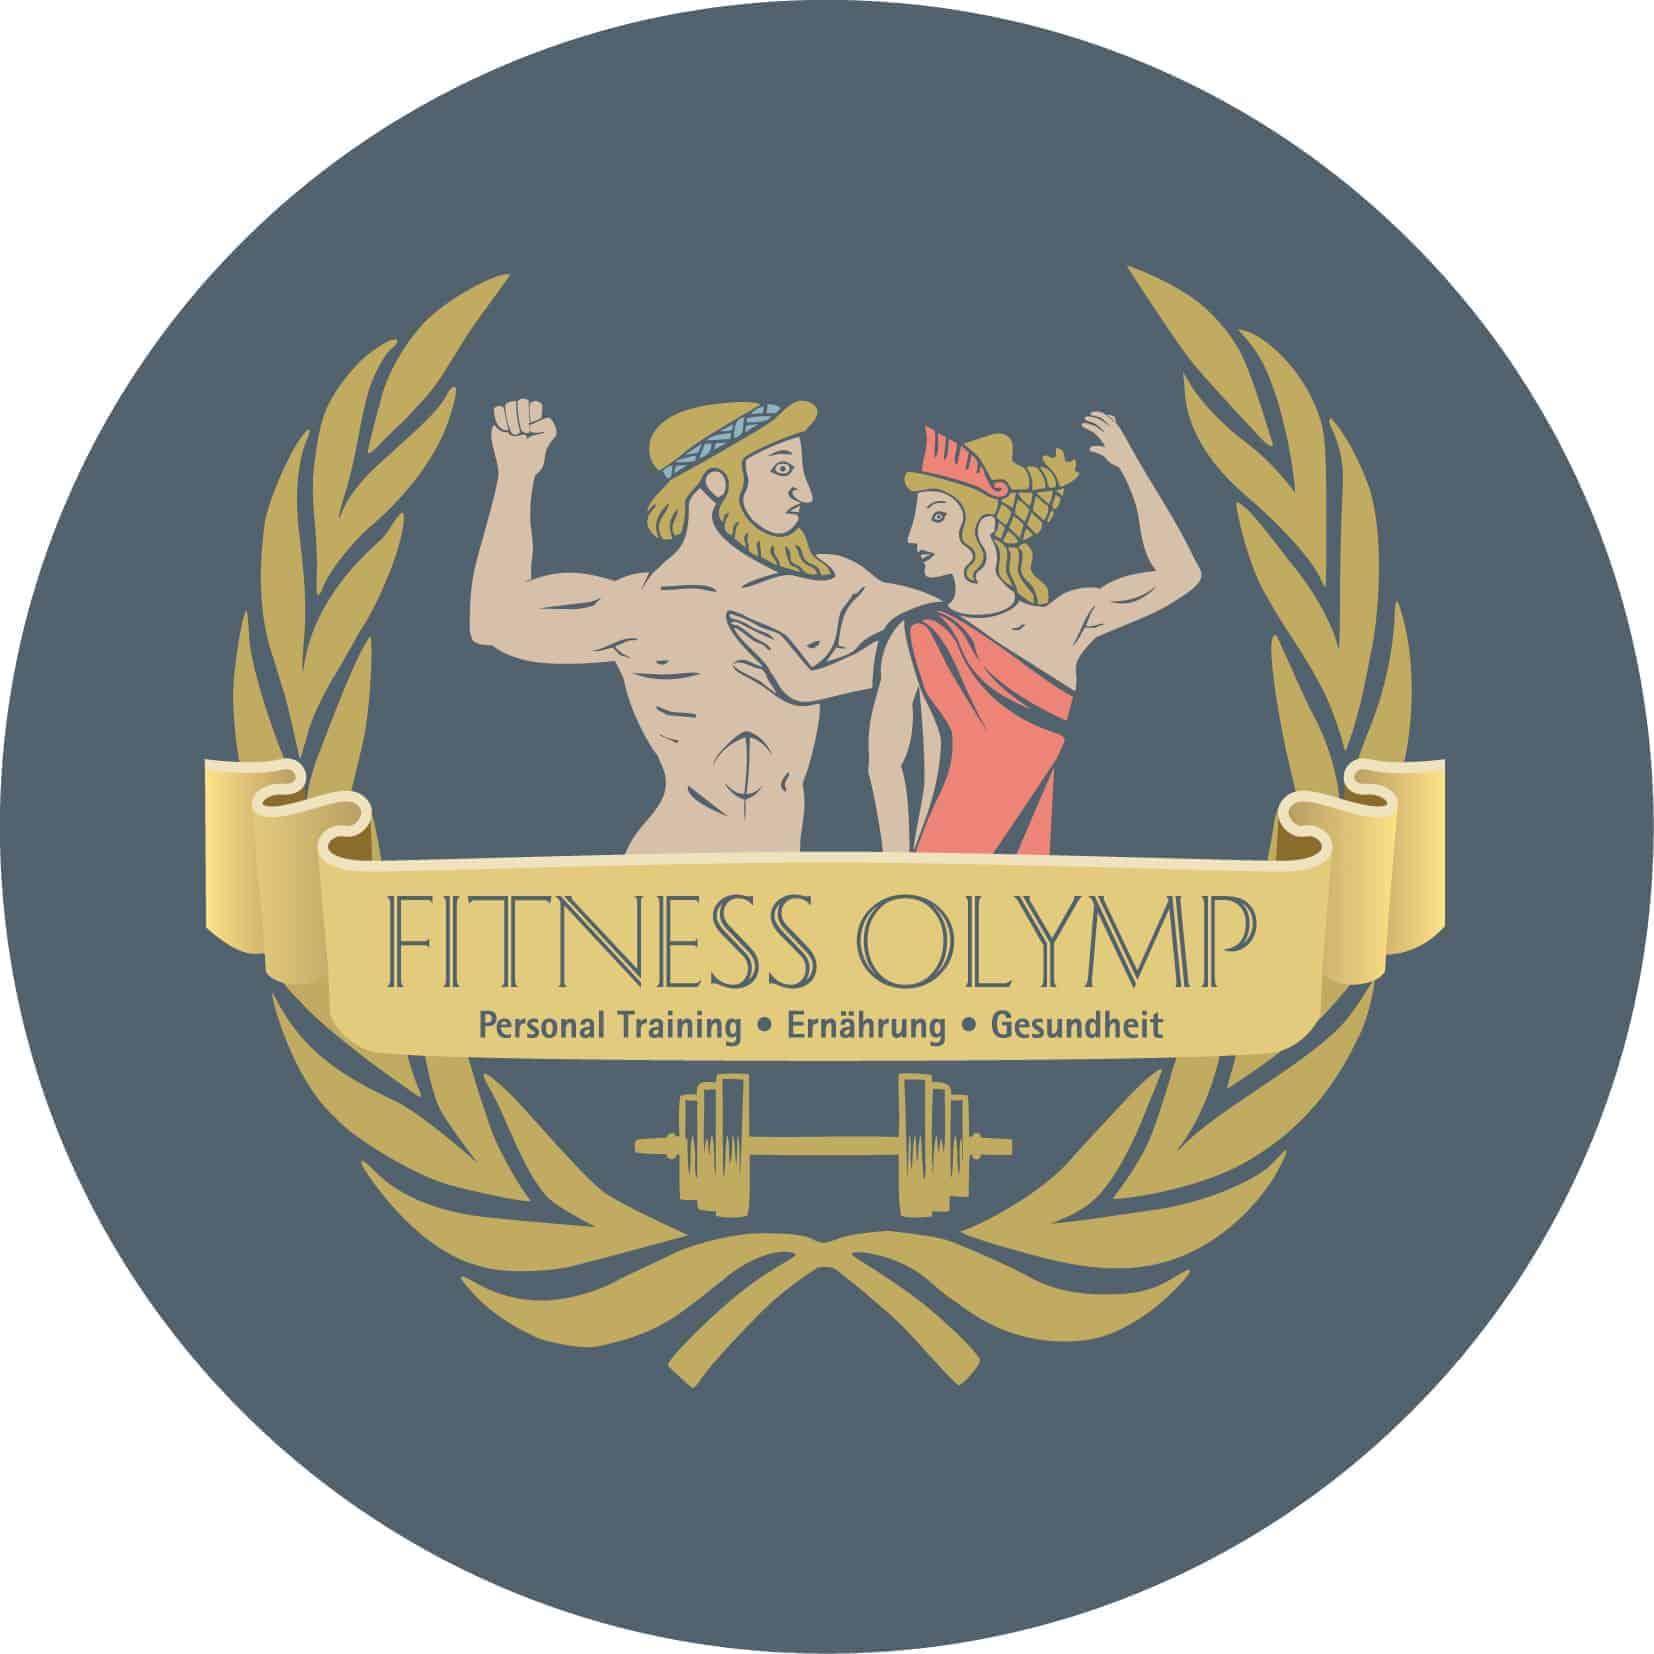 Fitness Olymp